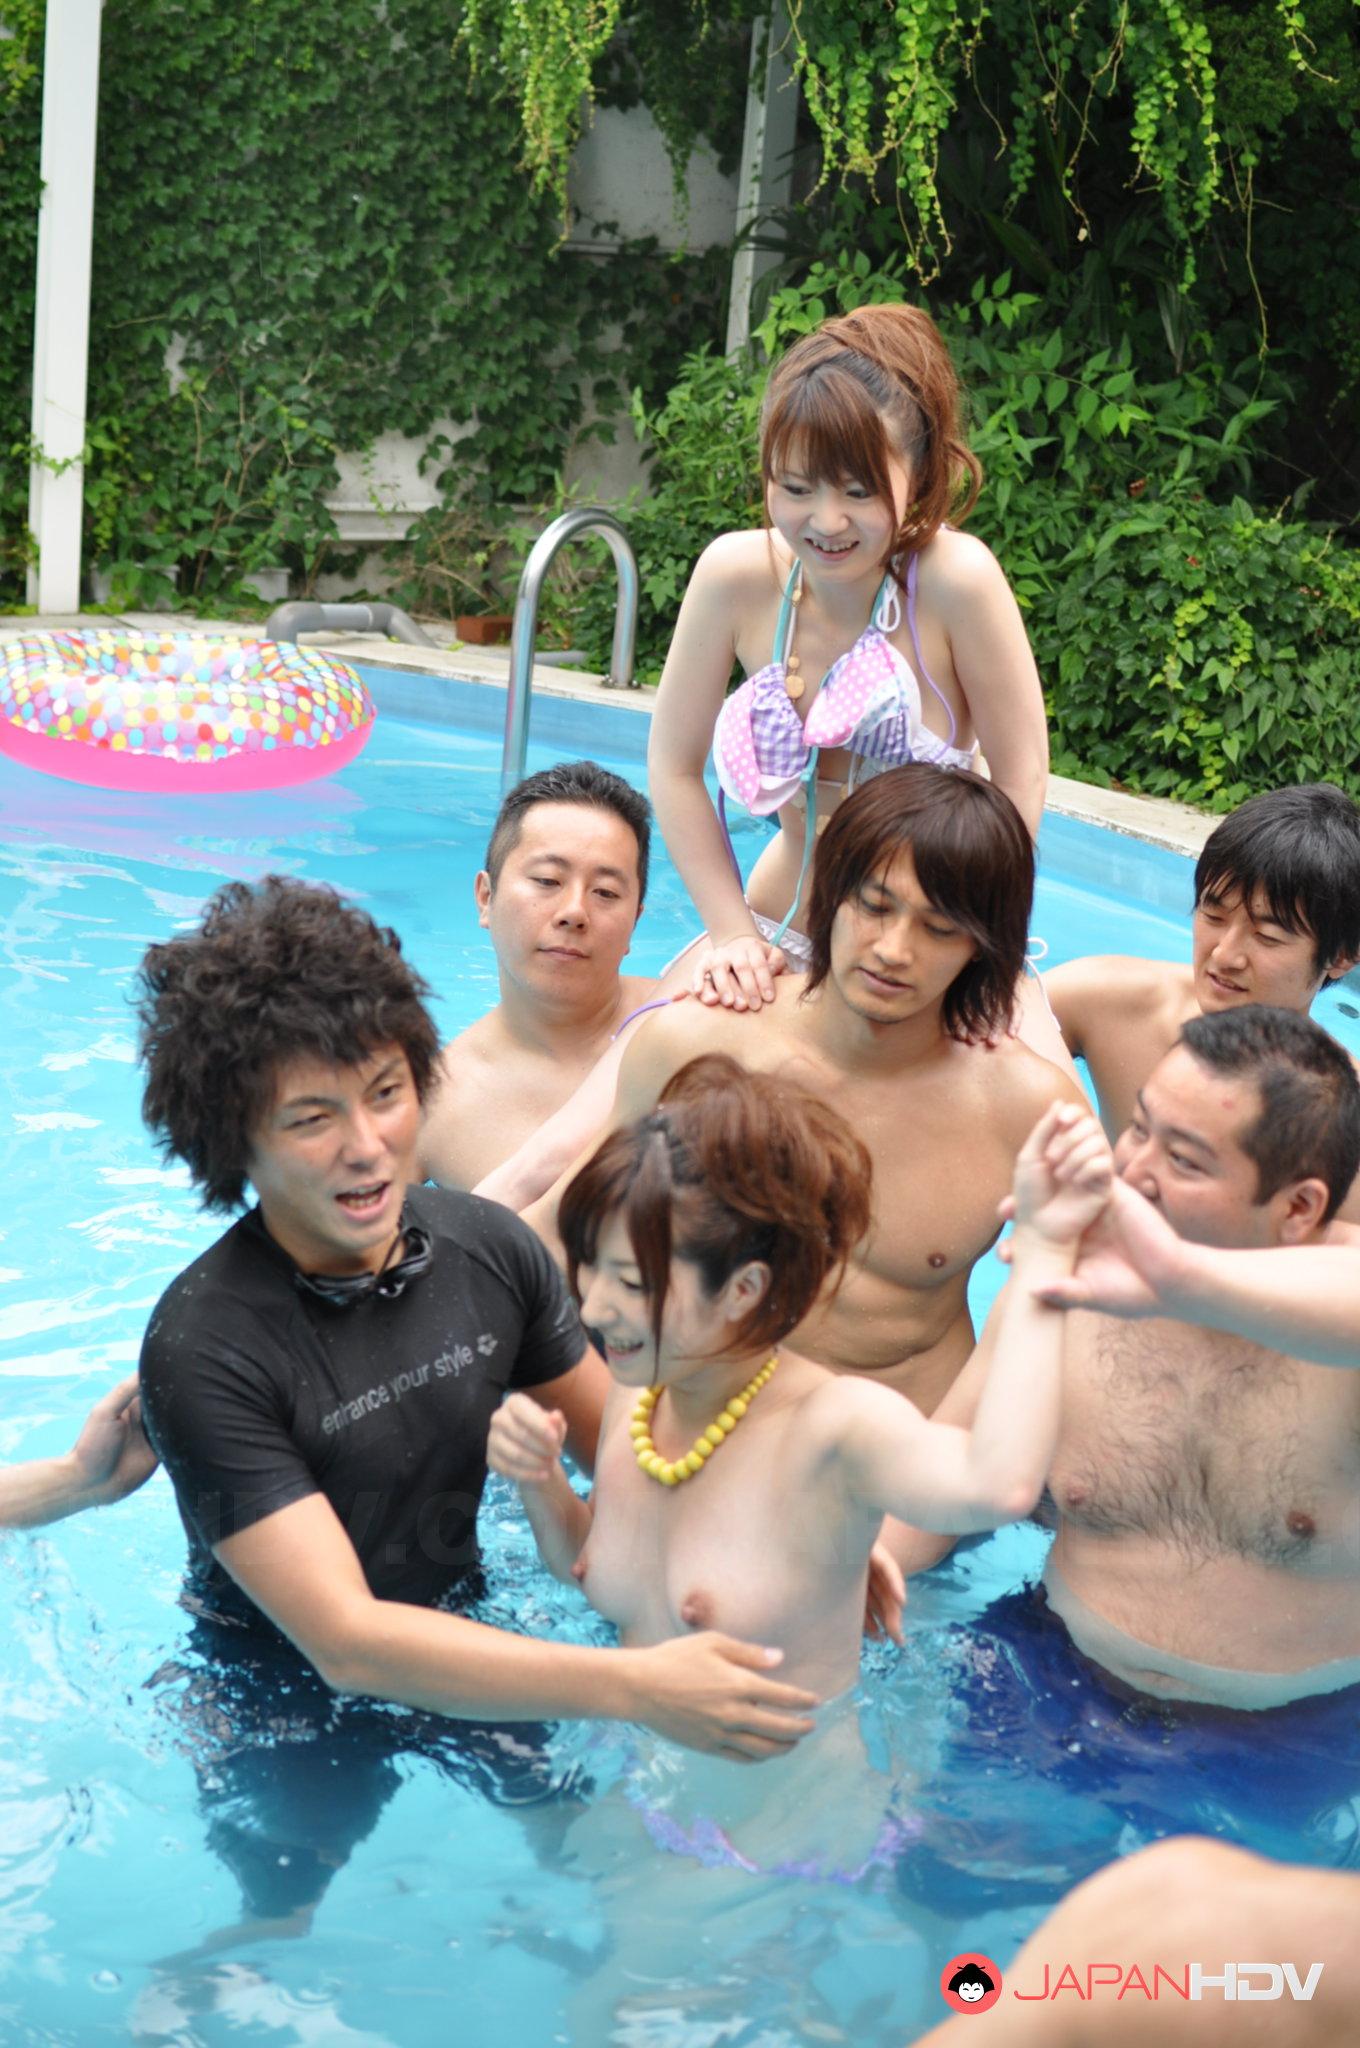 Consider, Porn japan girl fuck in pool consider